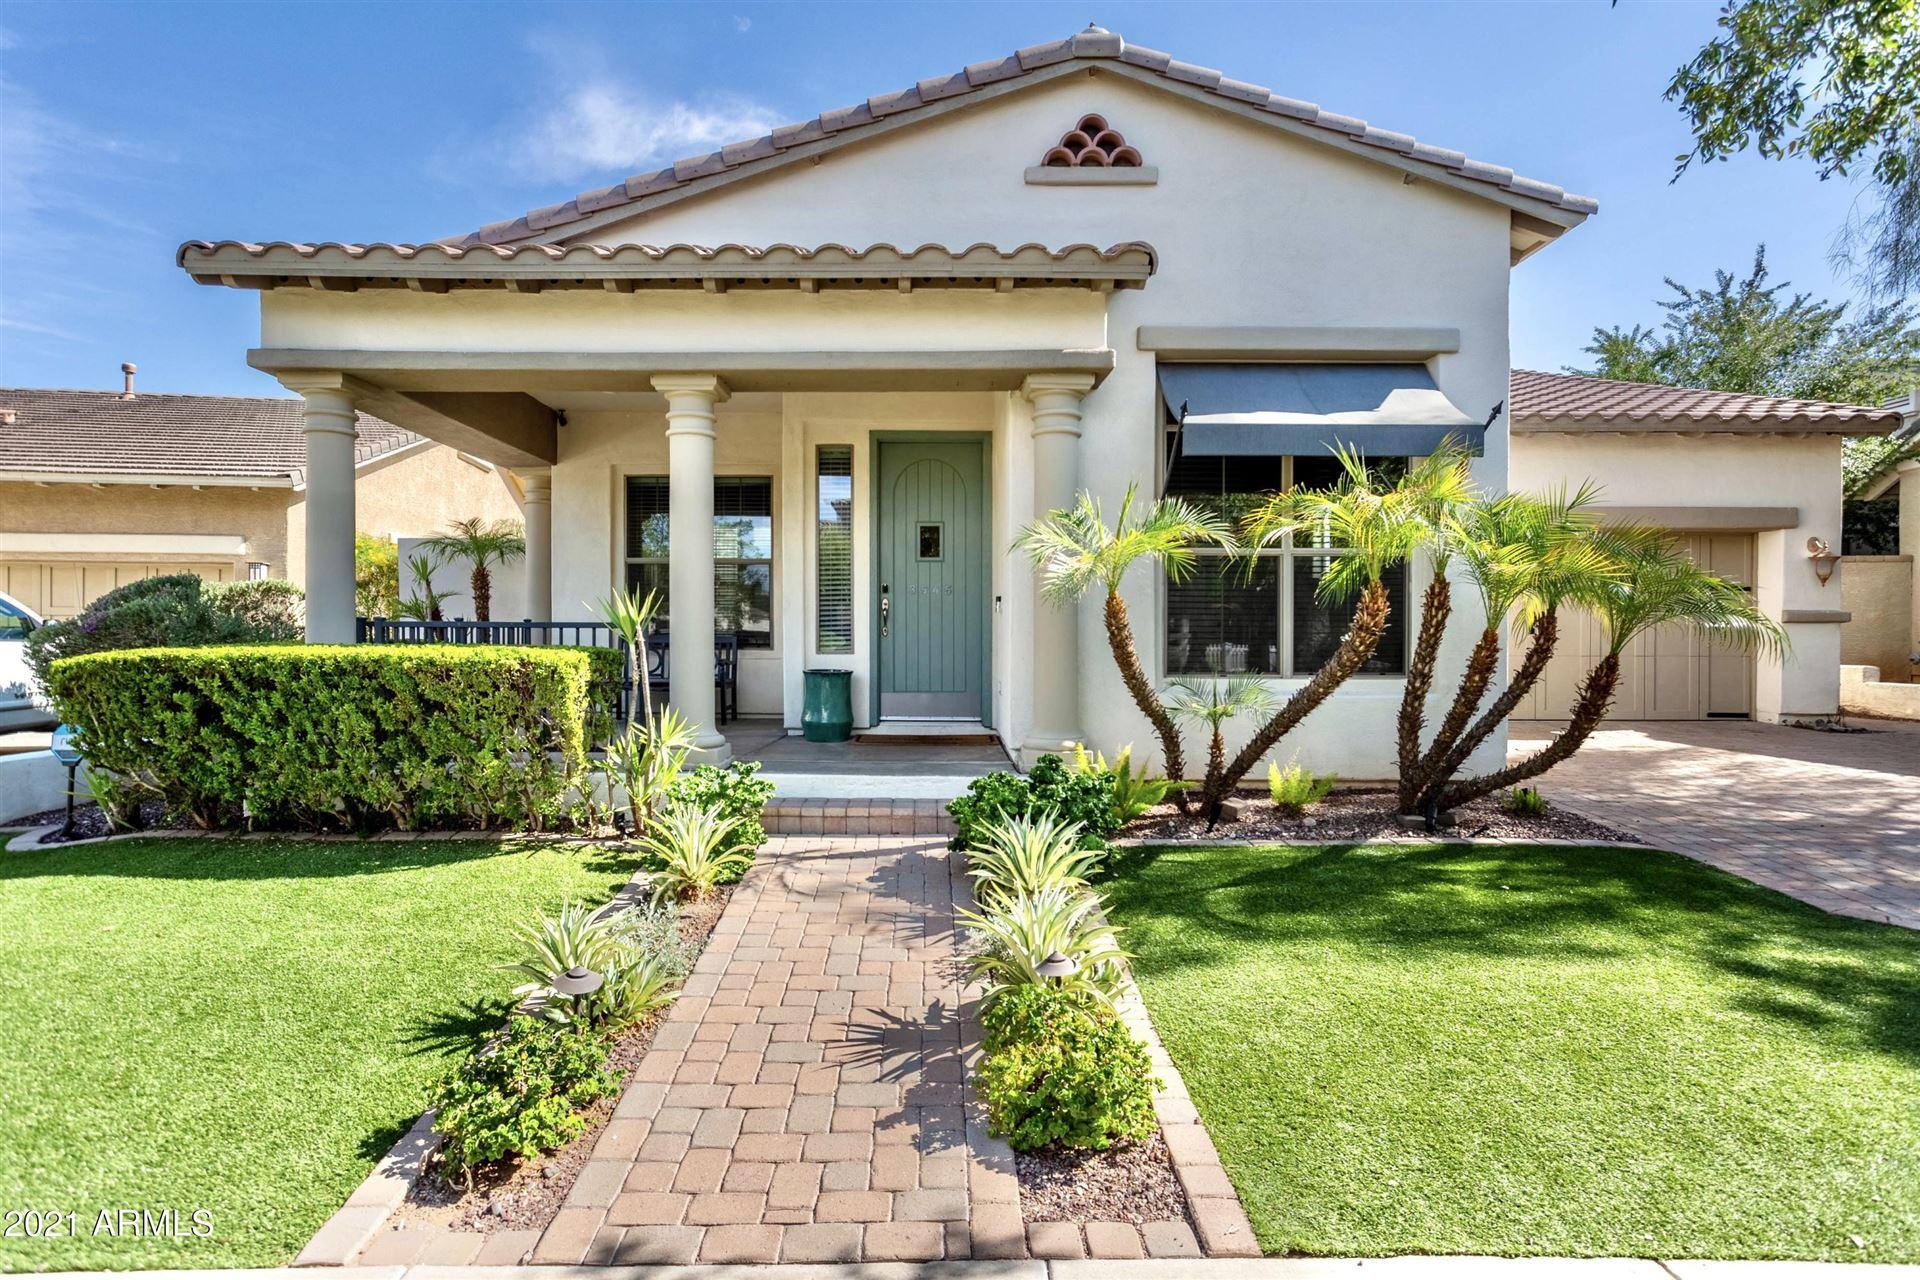 3945 N FOUNDER Circle, Buckeye, AZ 85396 - MLS#: 6257547